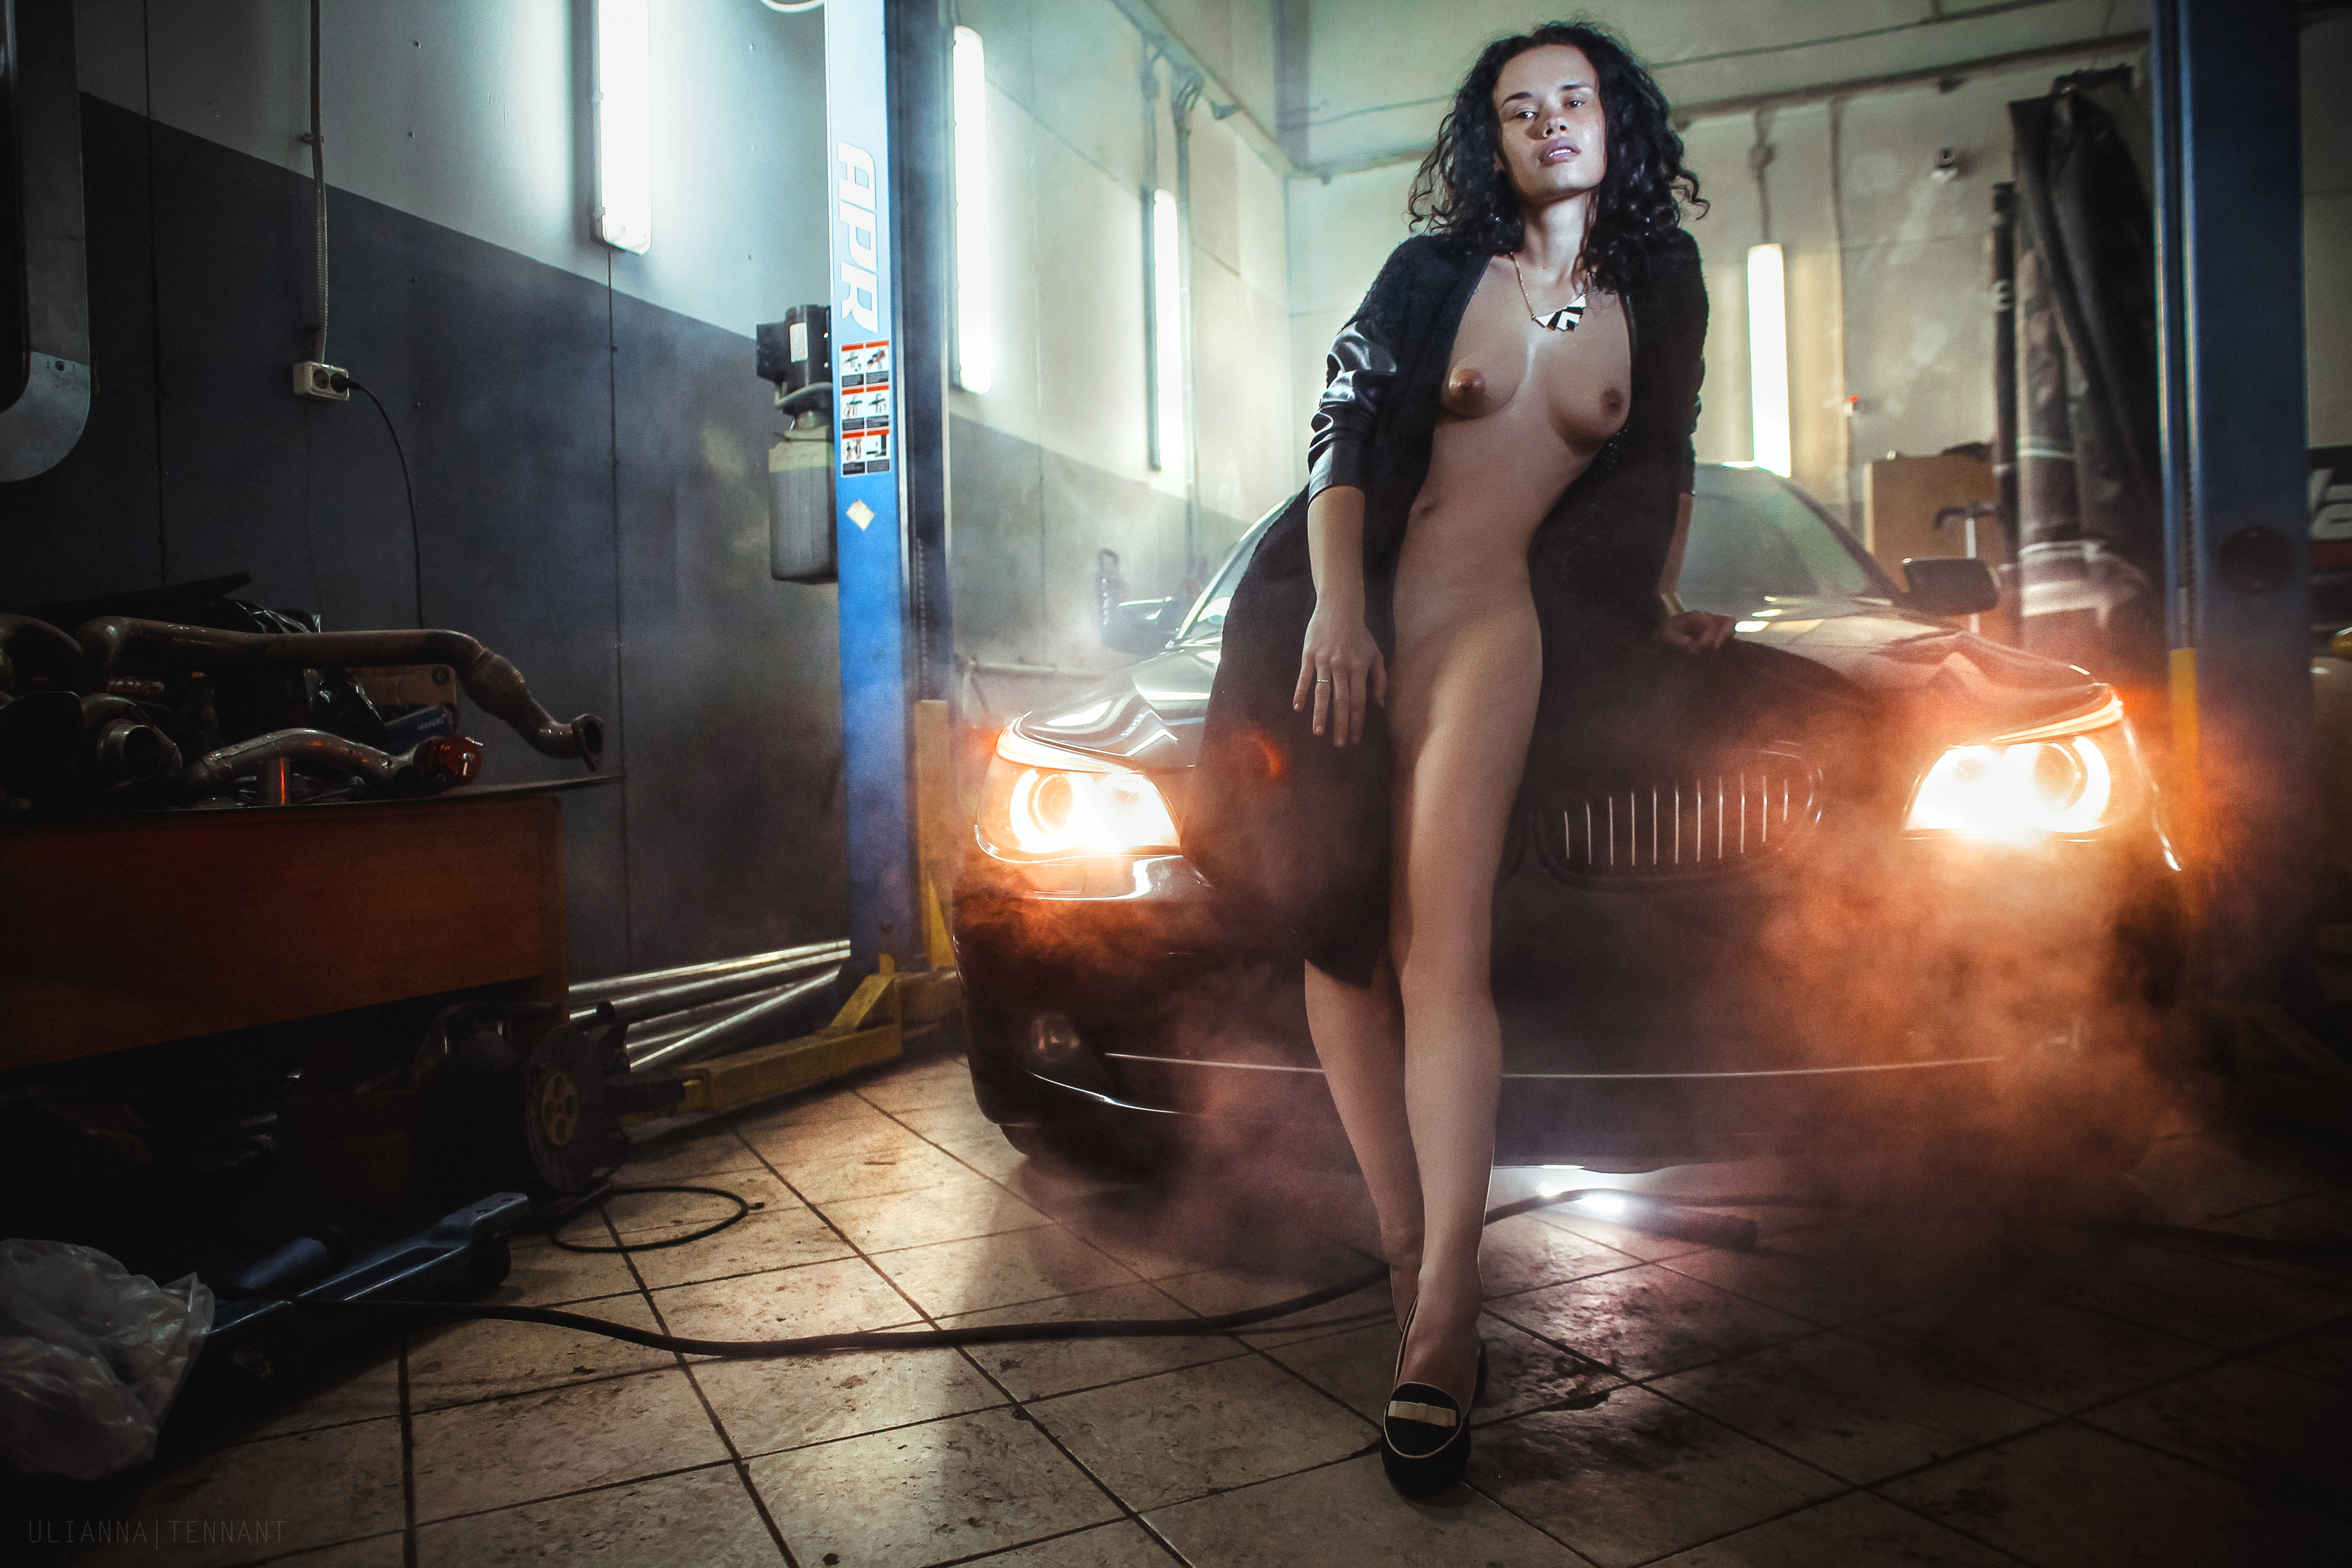 Обнаженная девушка у машины